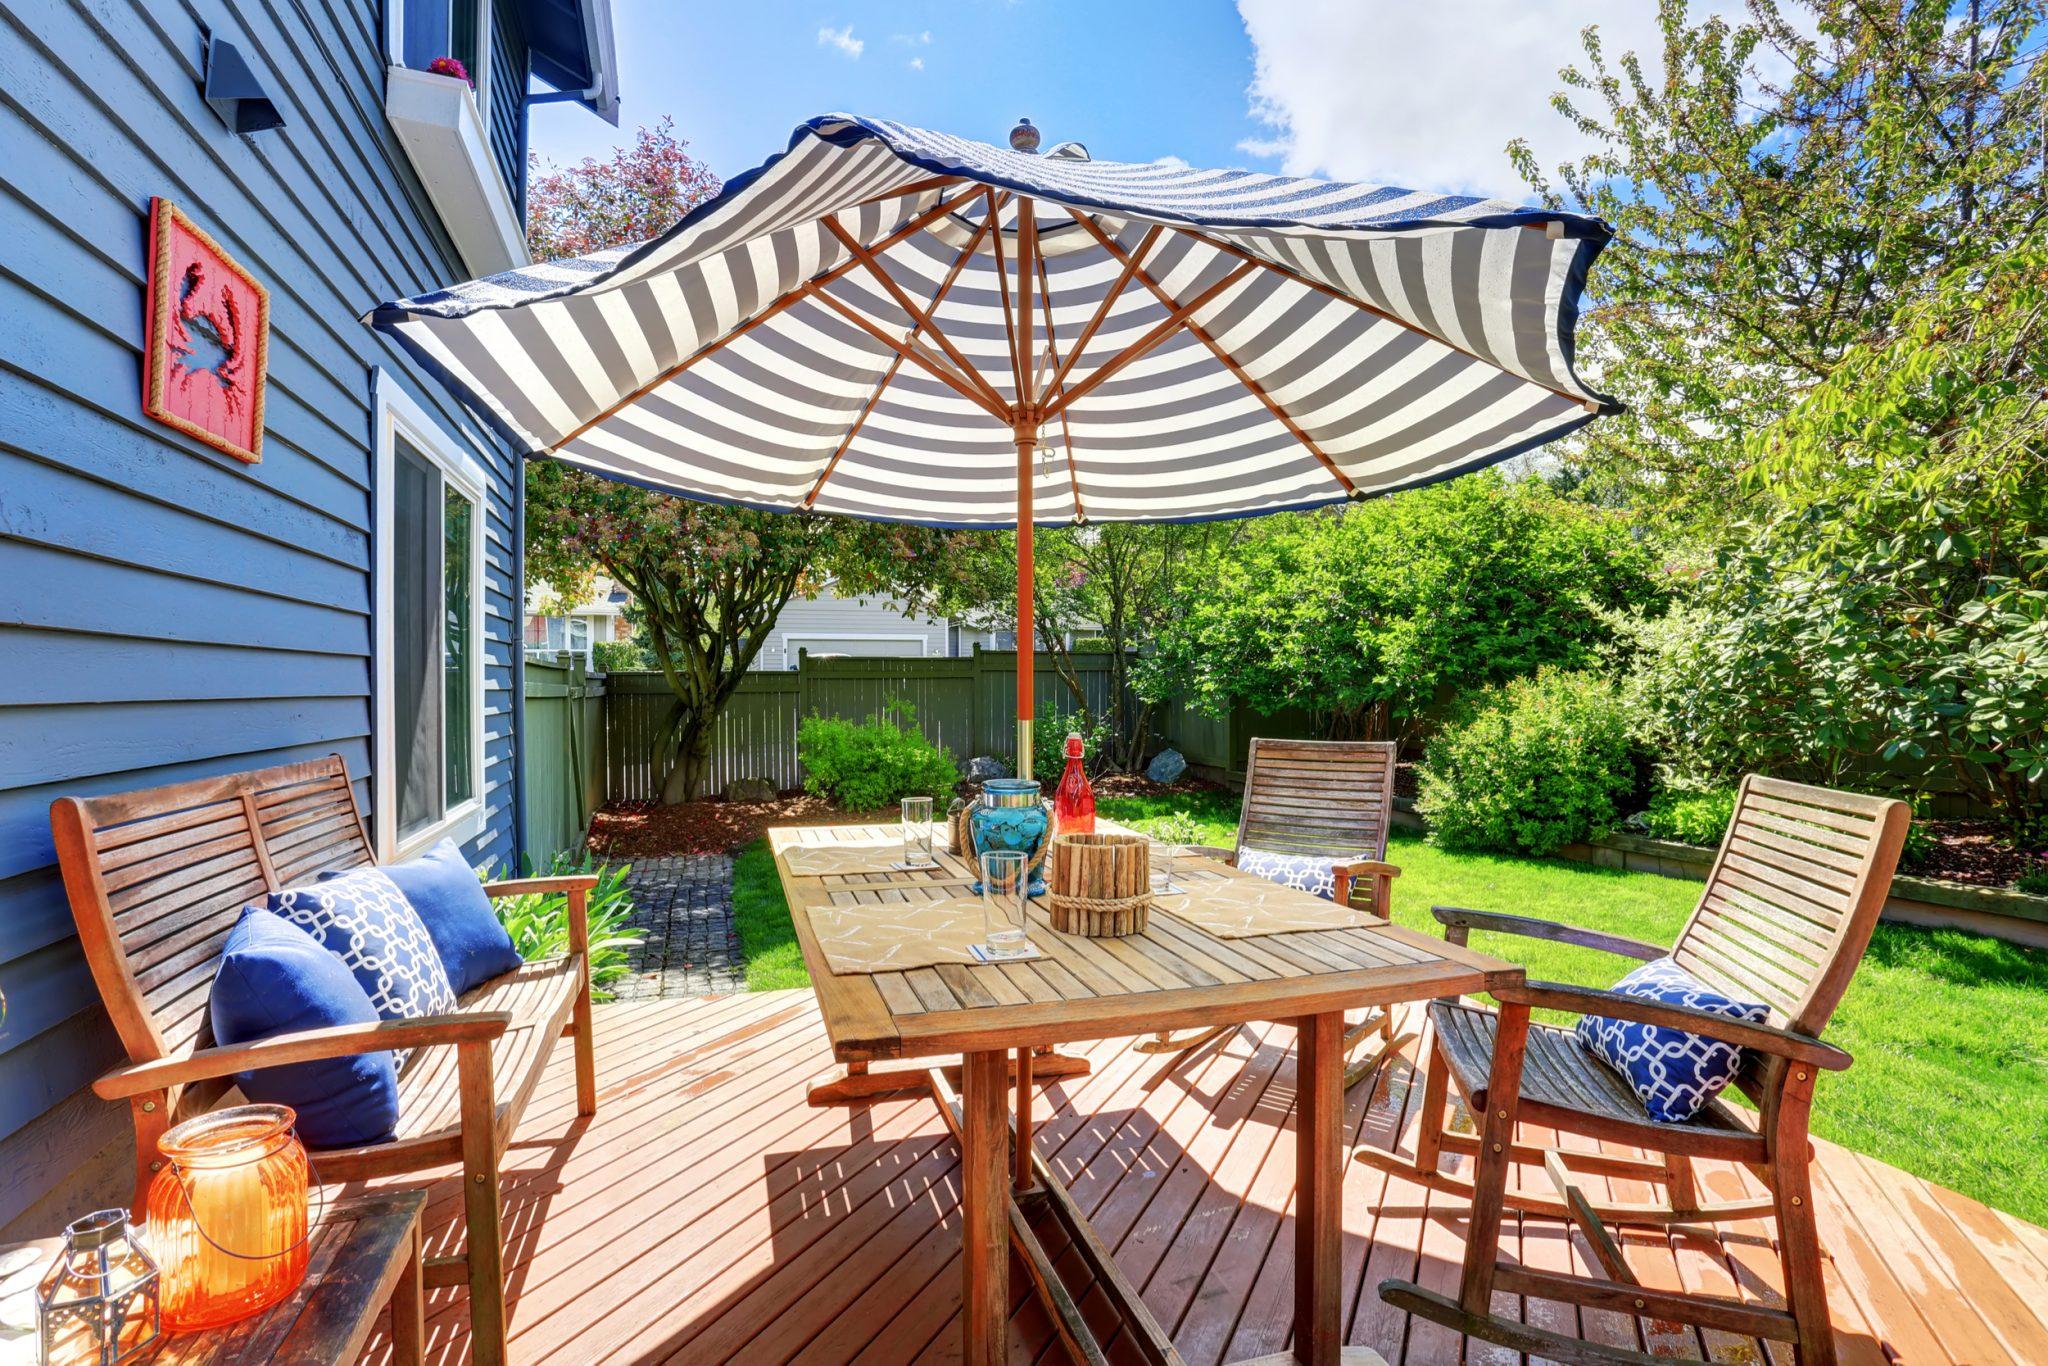 25 Patio Shade Ideas for Your Backyard | INSTALL-IT-DIRECT on Shady Yard Ideas  id=70832